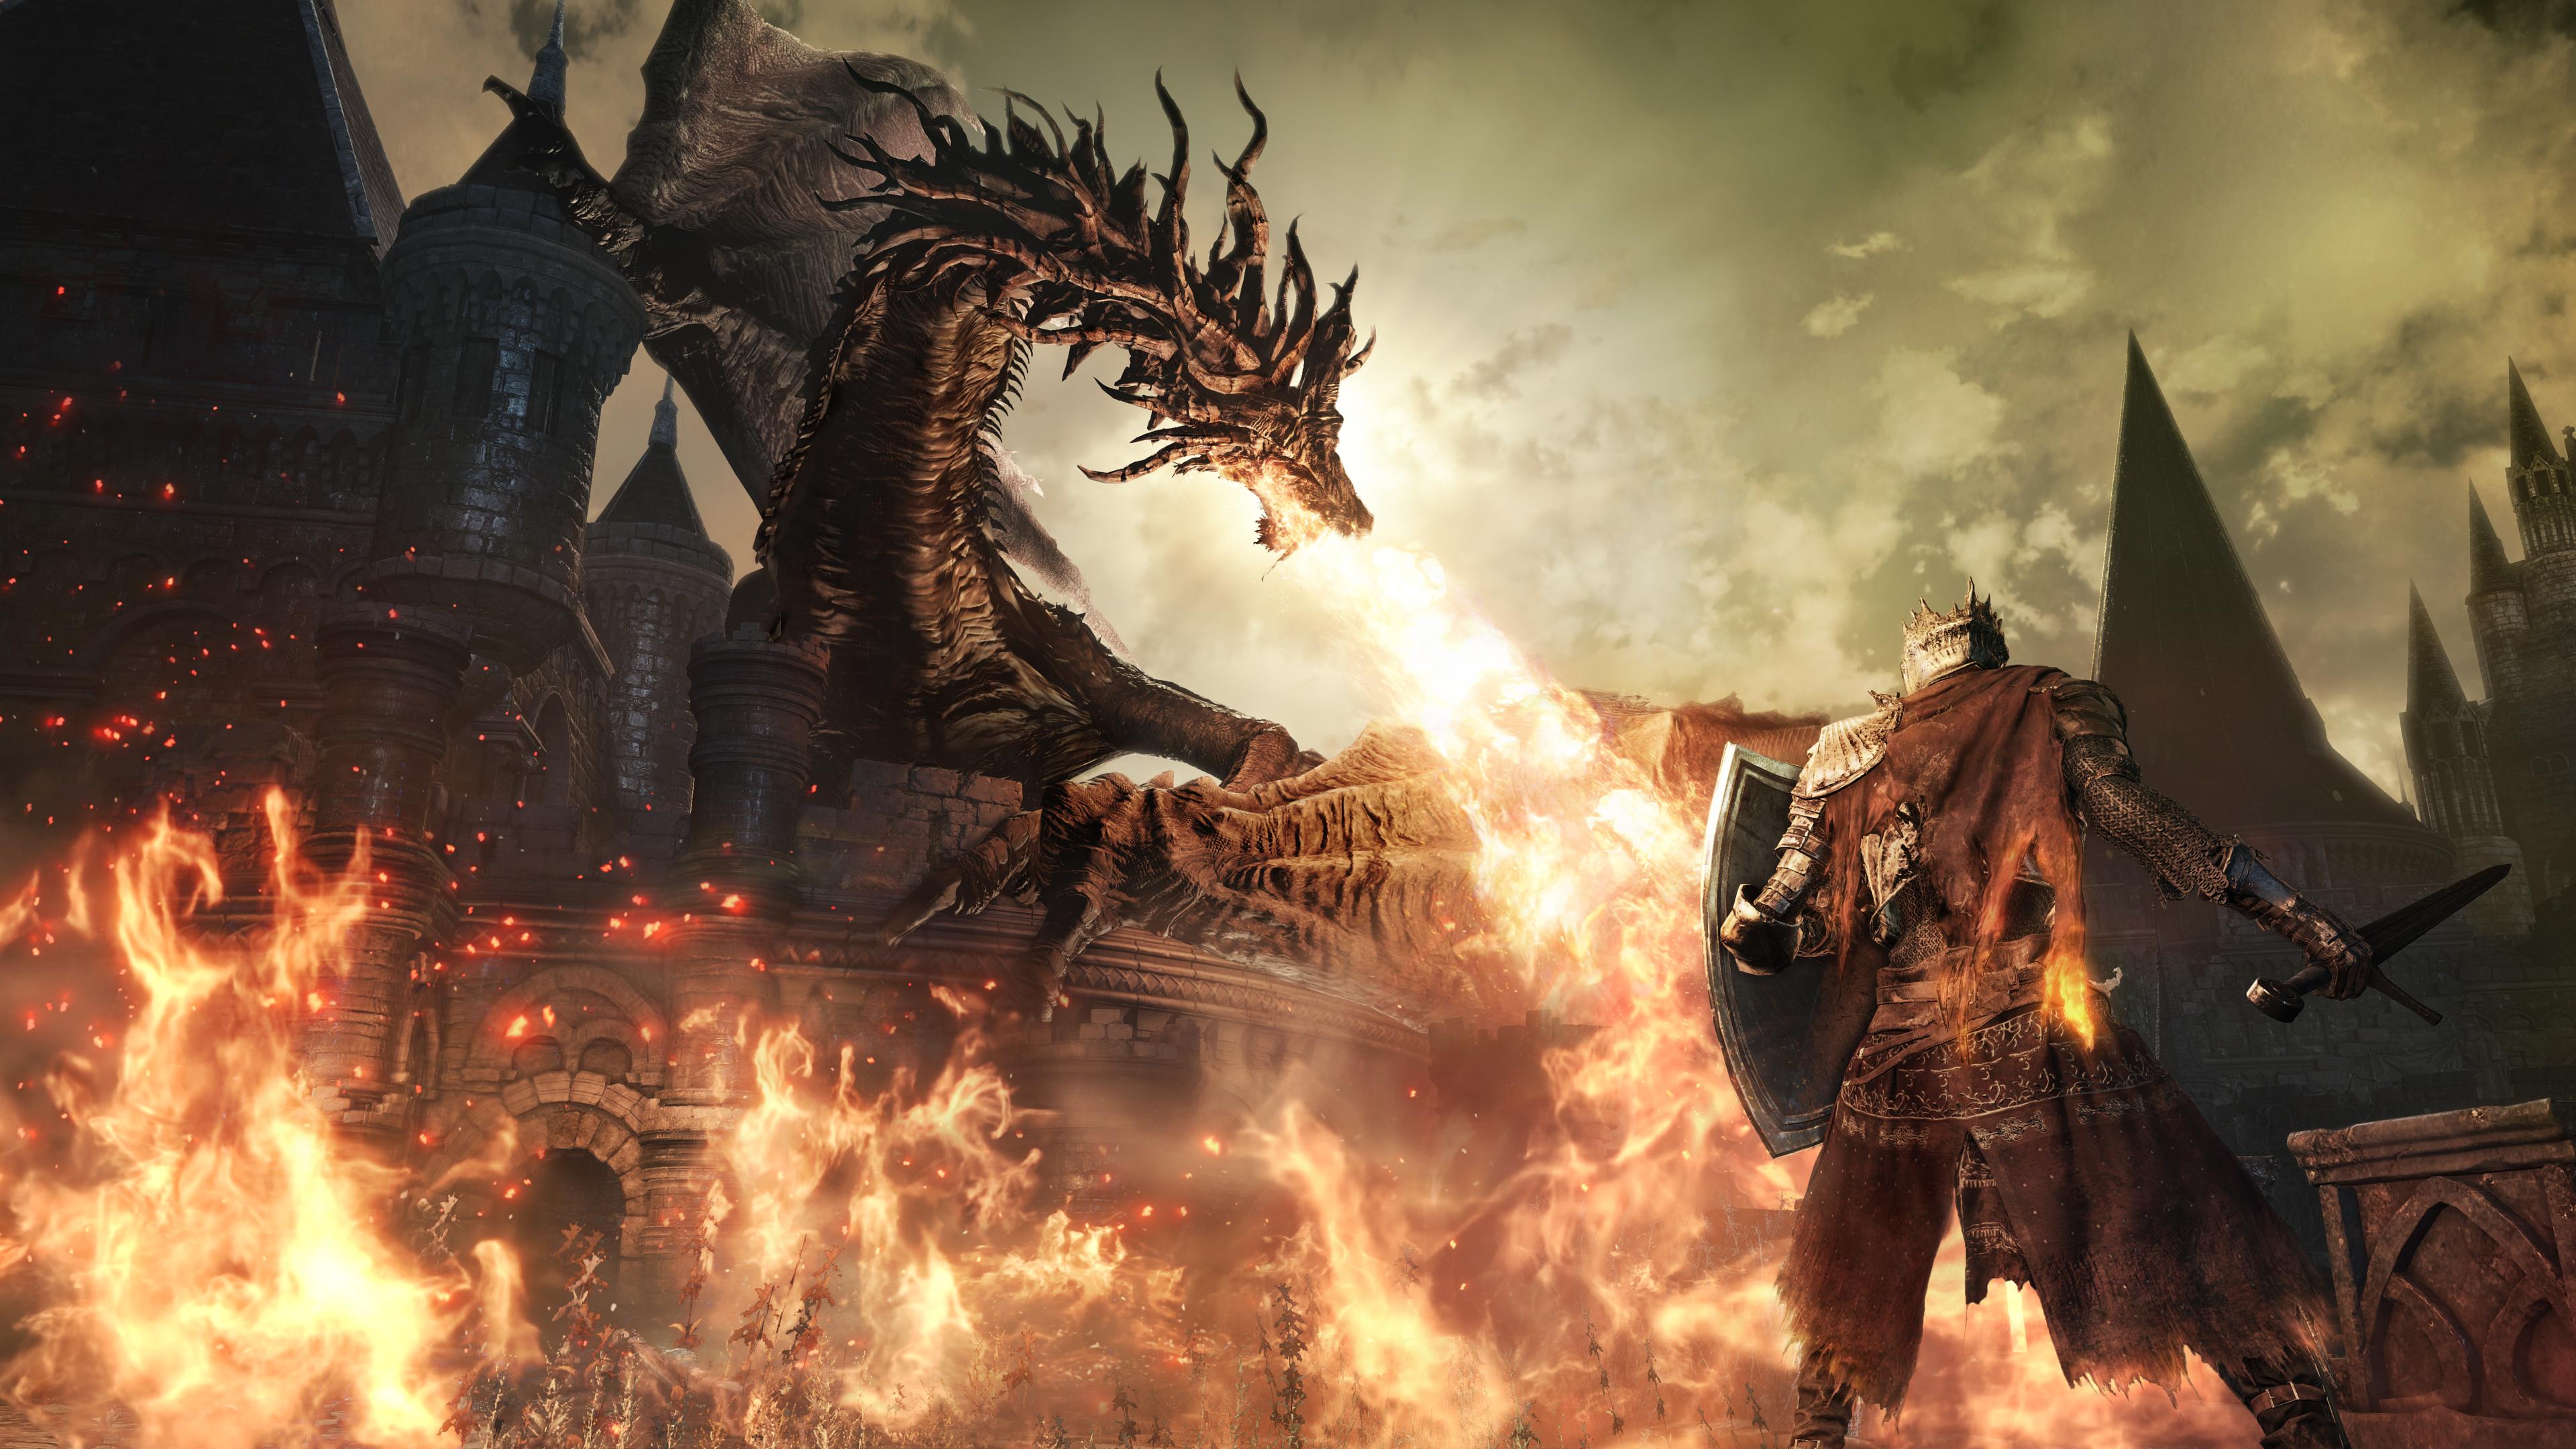 Dark Souls 3 Wallpaper Concept Art Downloads ThemePack 3840x2160